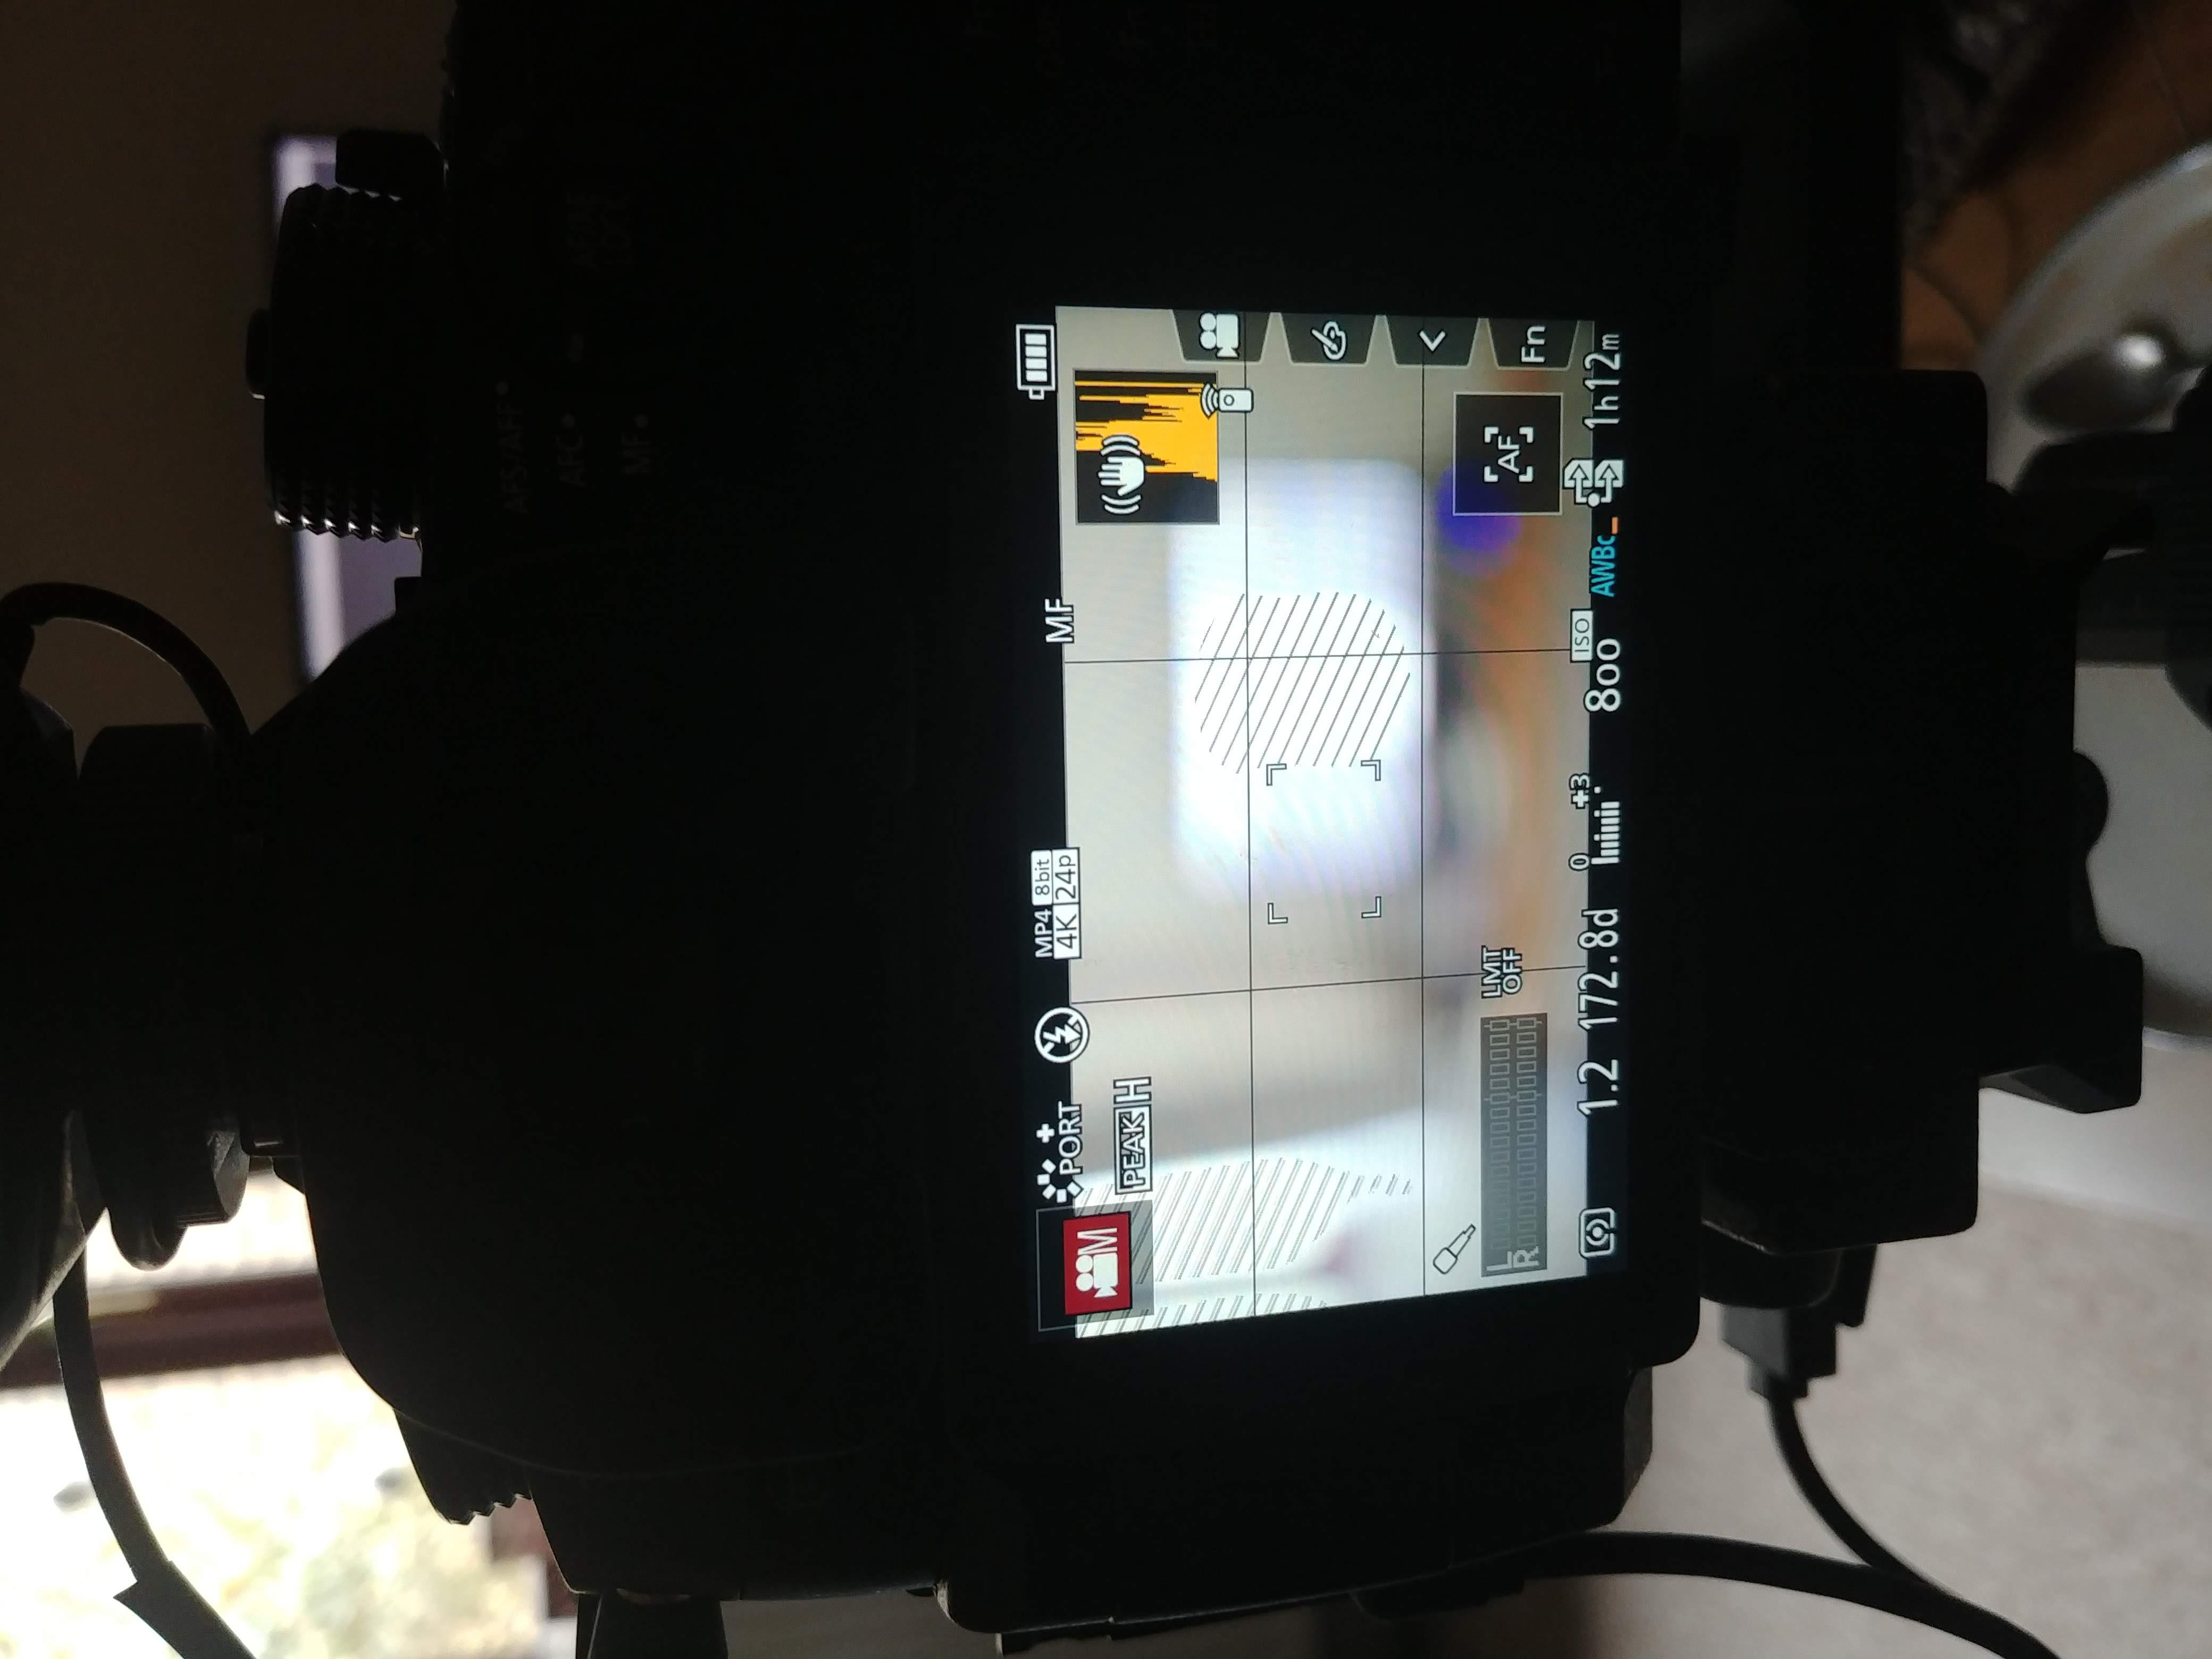 Screen Image of camera